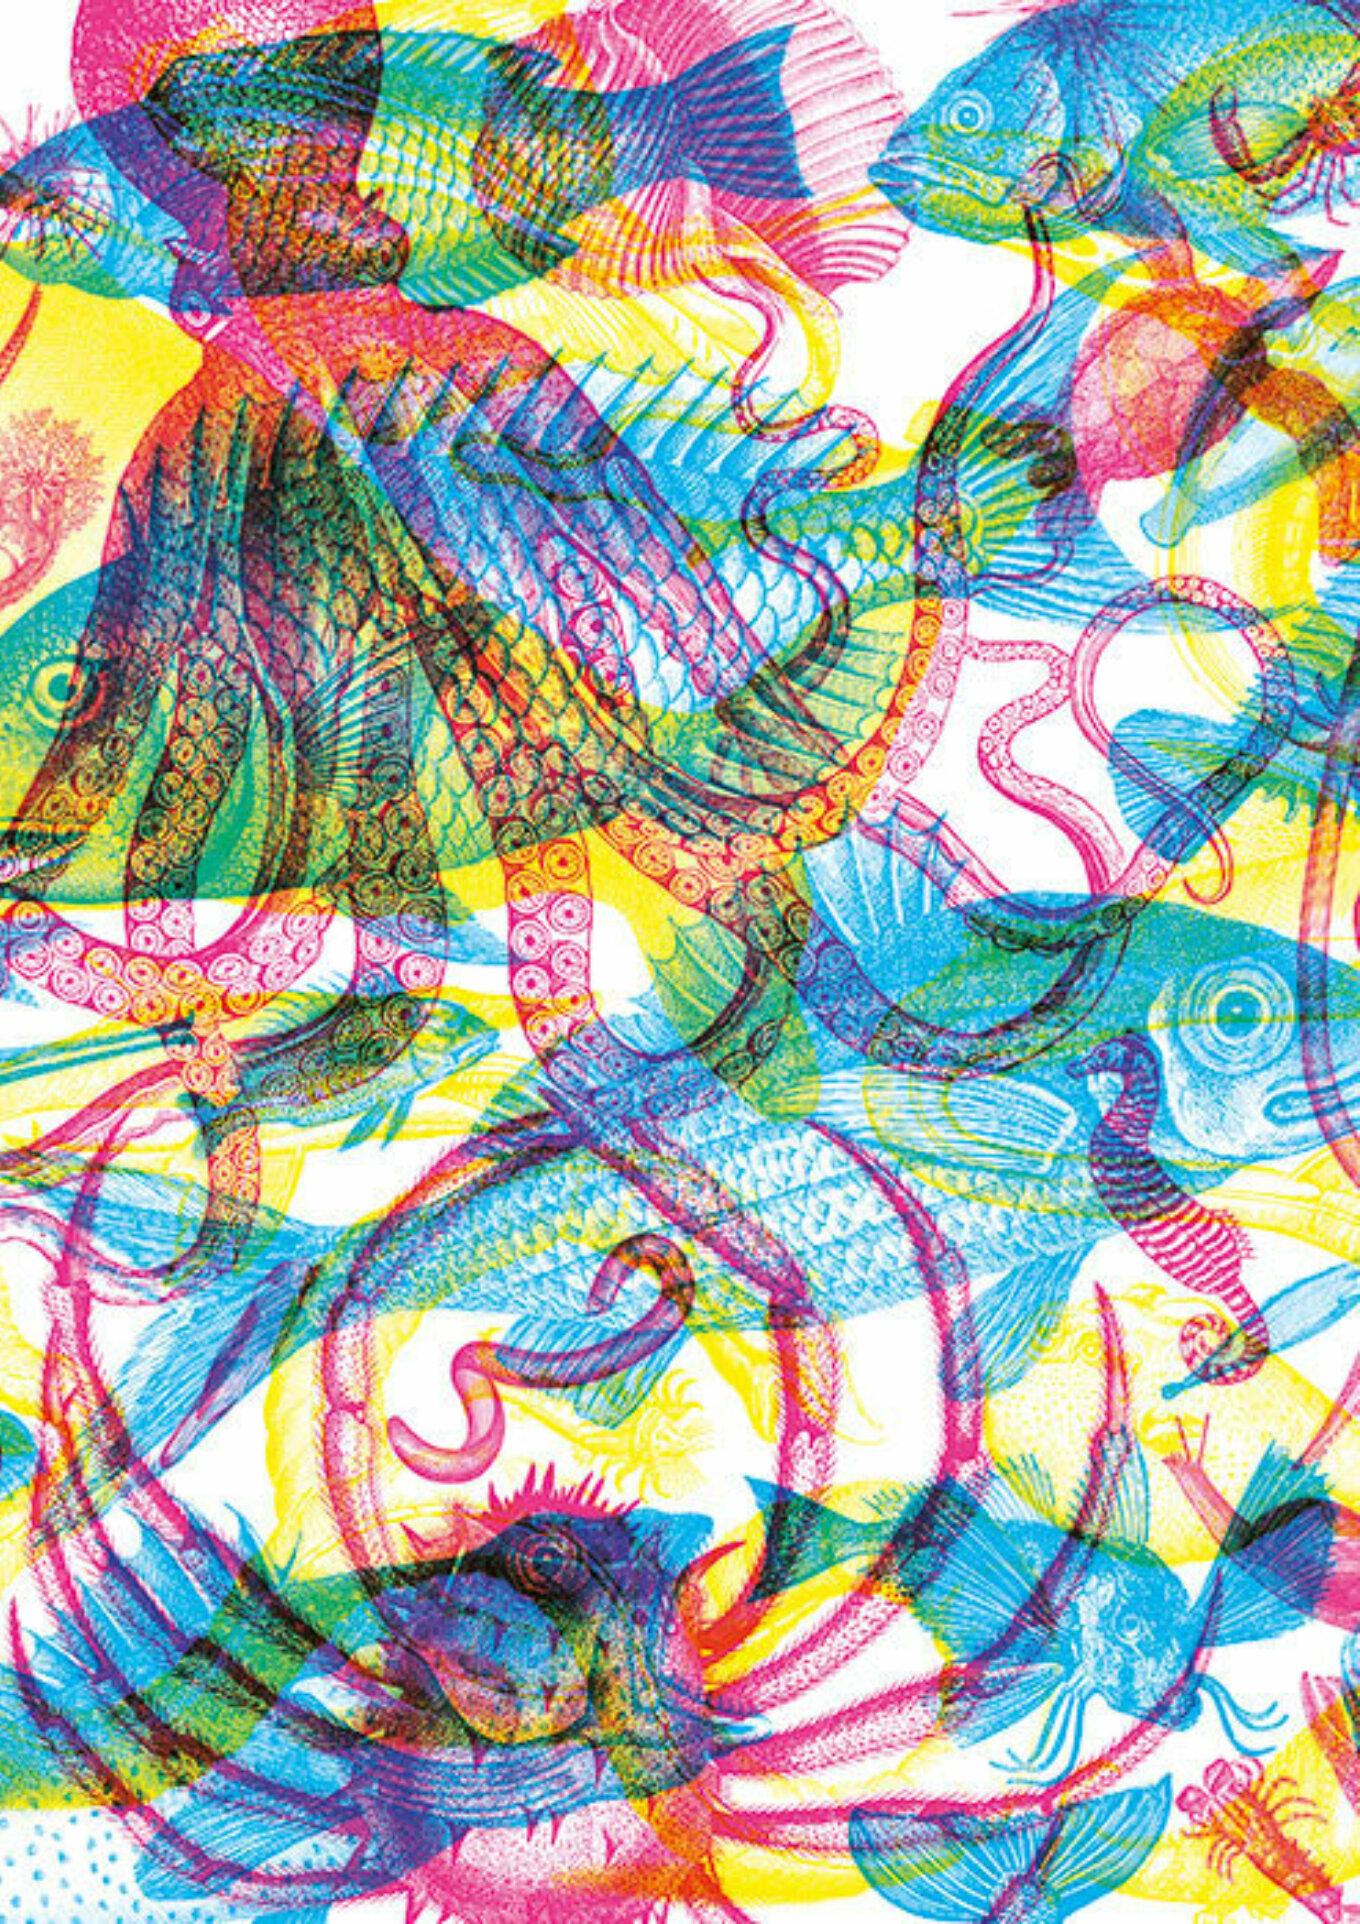 Carnovsky Animalia 2